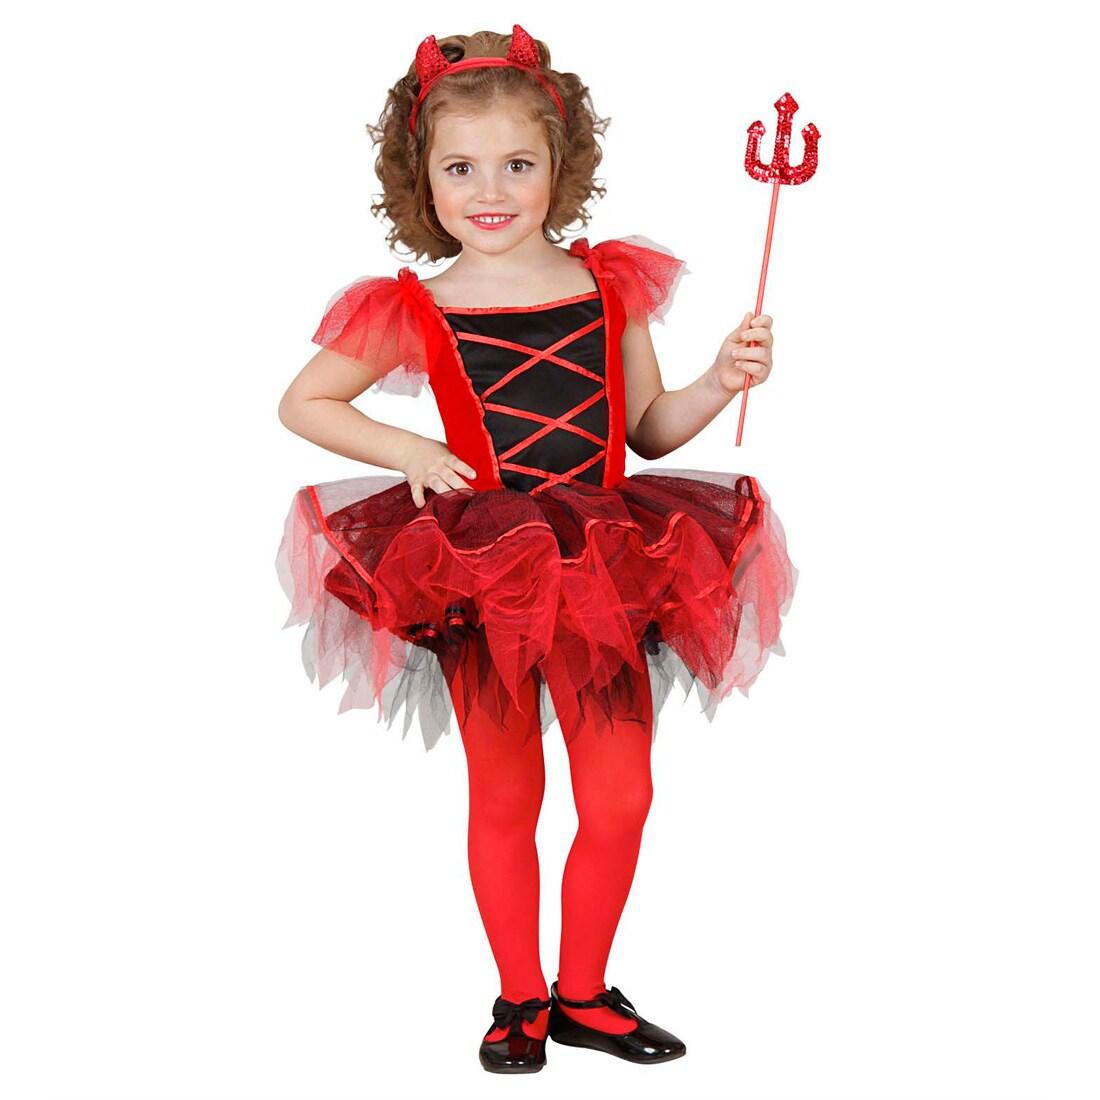 kinder teufel kost m ballerina teufelkost m rot xs 110cm 3 4 jahre 23 99. Black Bedroom Furniture Sets. Home Design Ideas